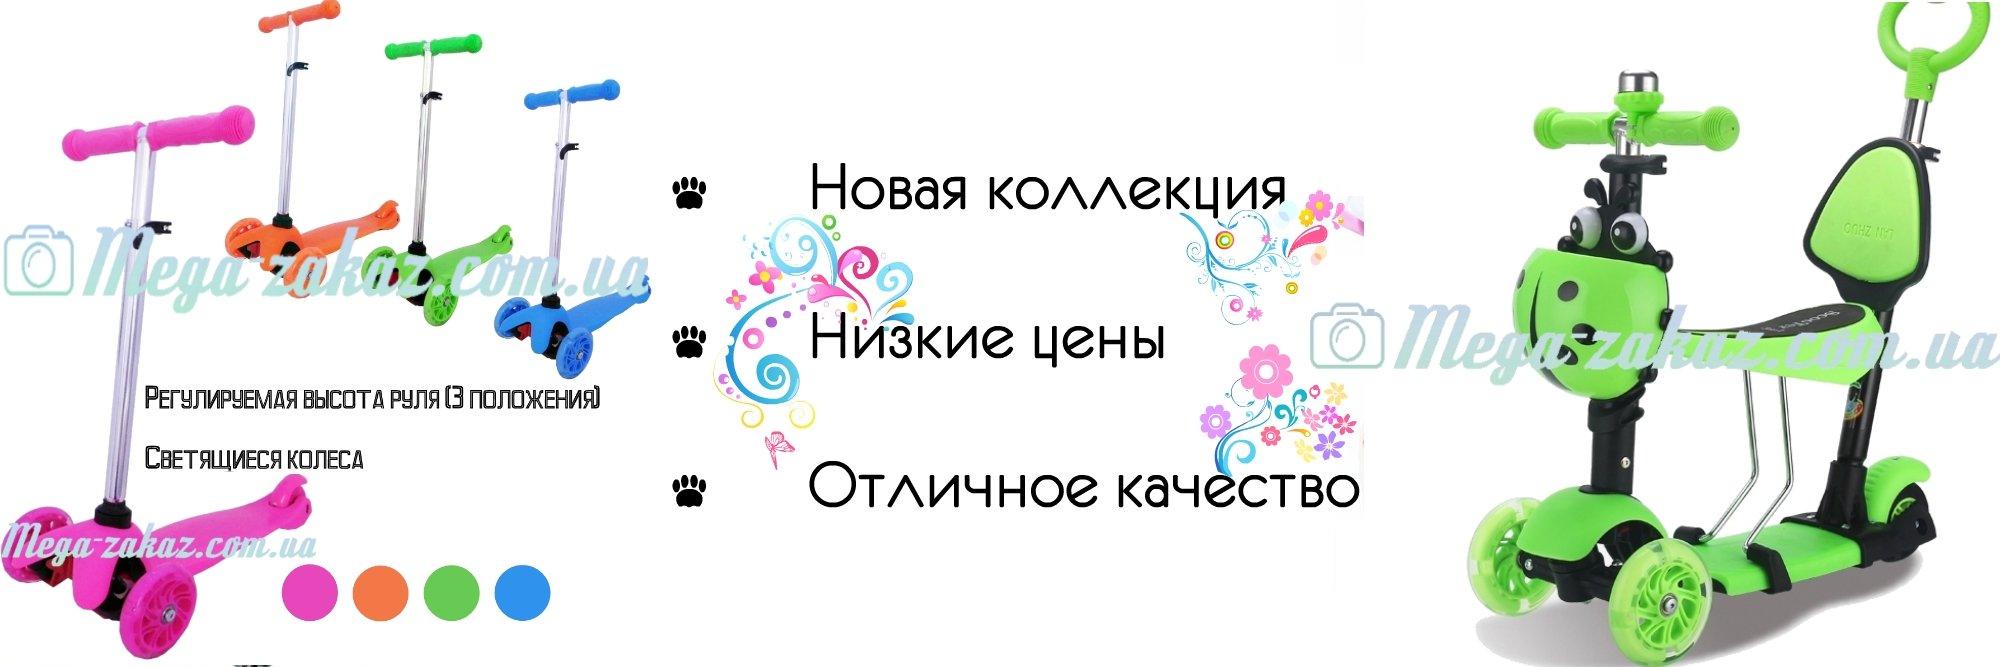 http://mega-zakaz.com.ua/images/upload/коллаж%20самокаты.jpg